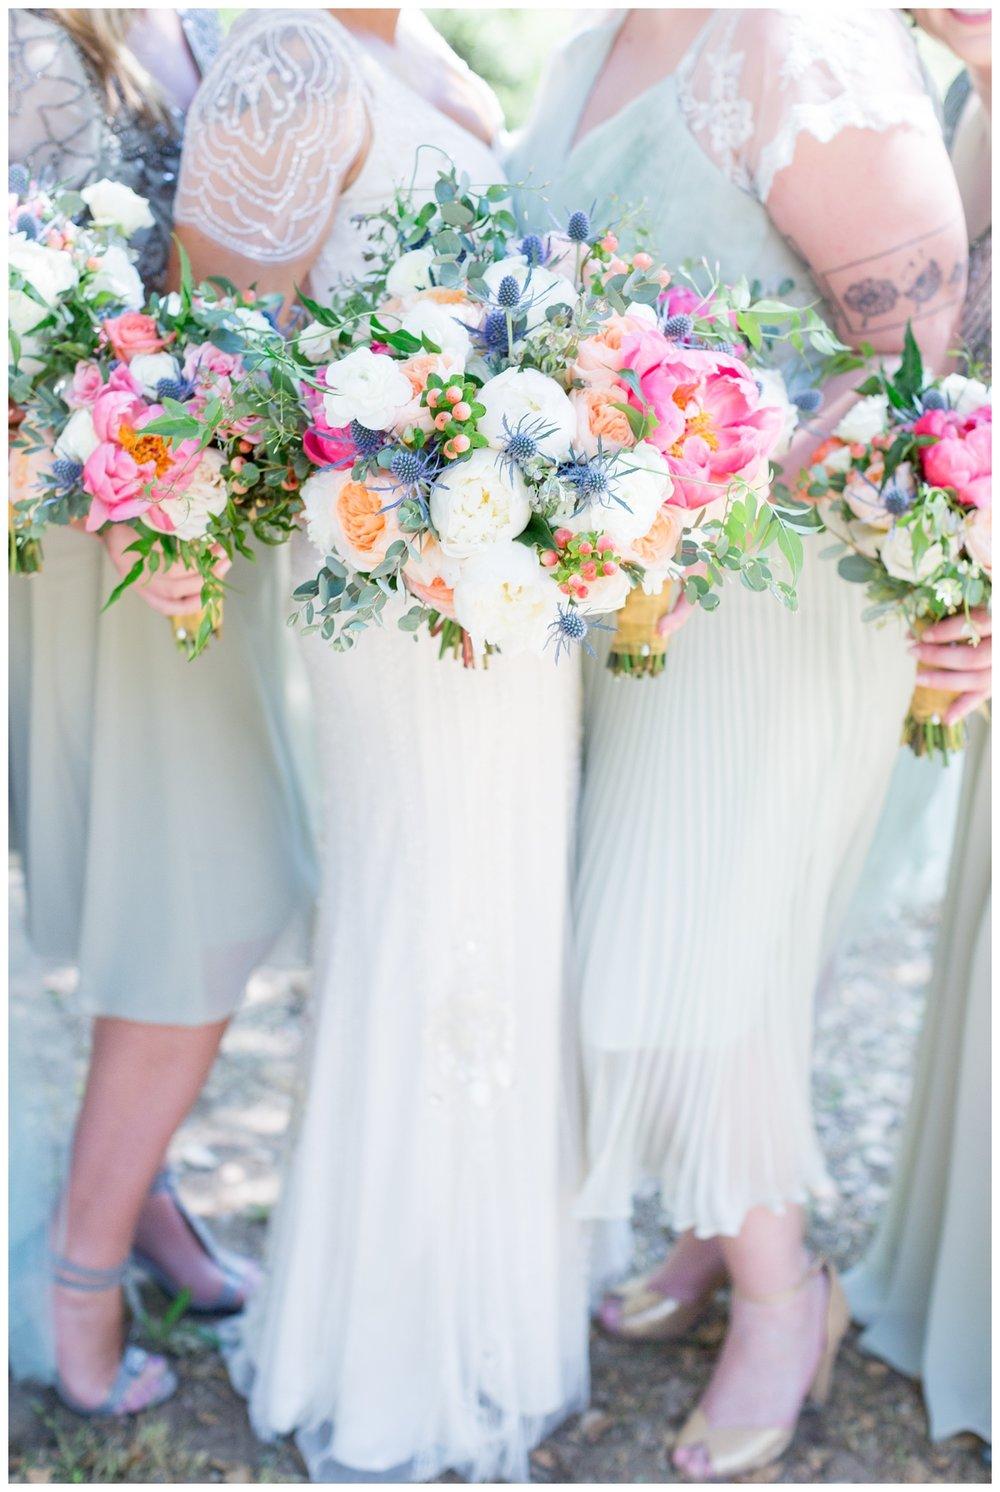 Honey Run Covered Bridge Wedding Photos - Chase&Sabrina